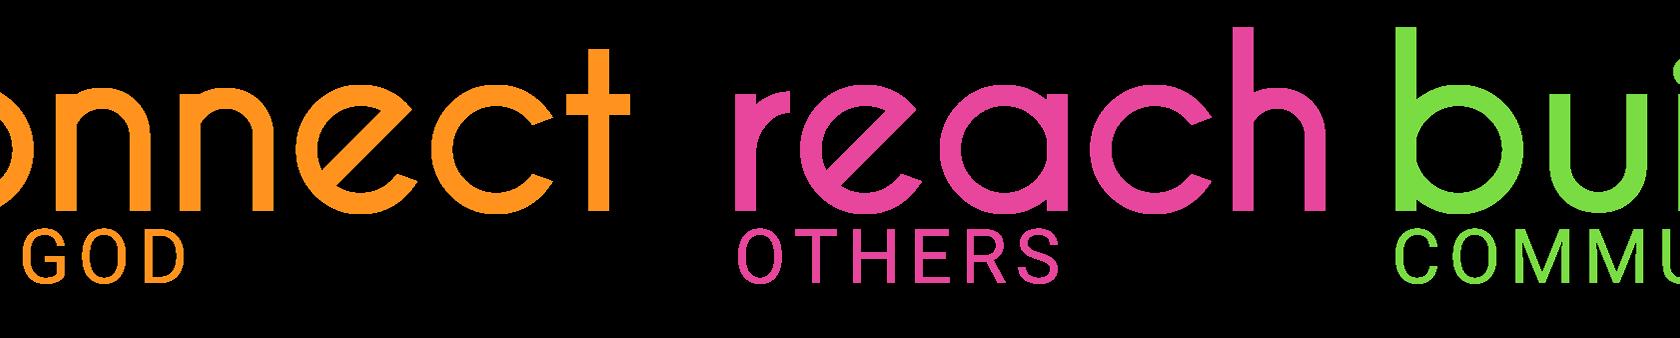 Connect – Reach – Build